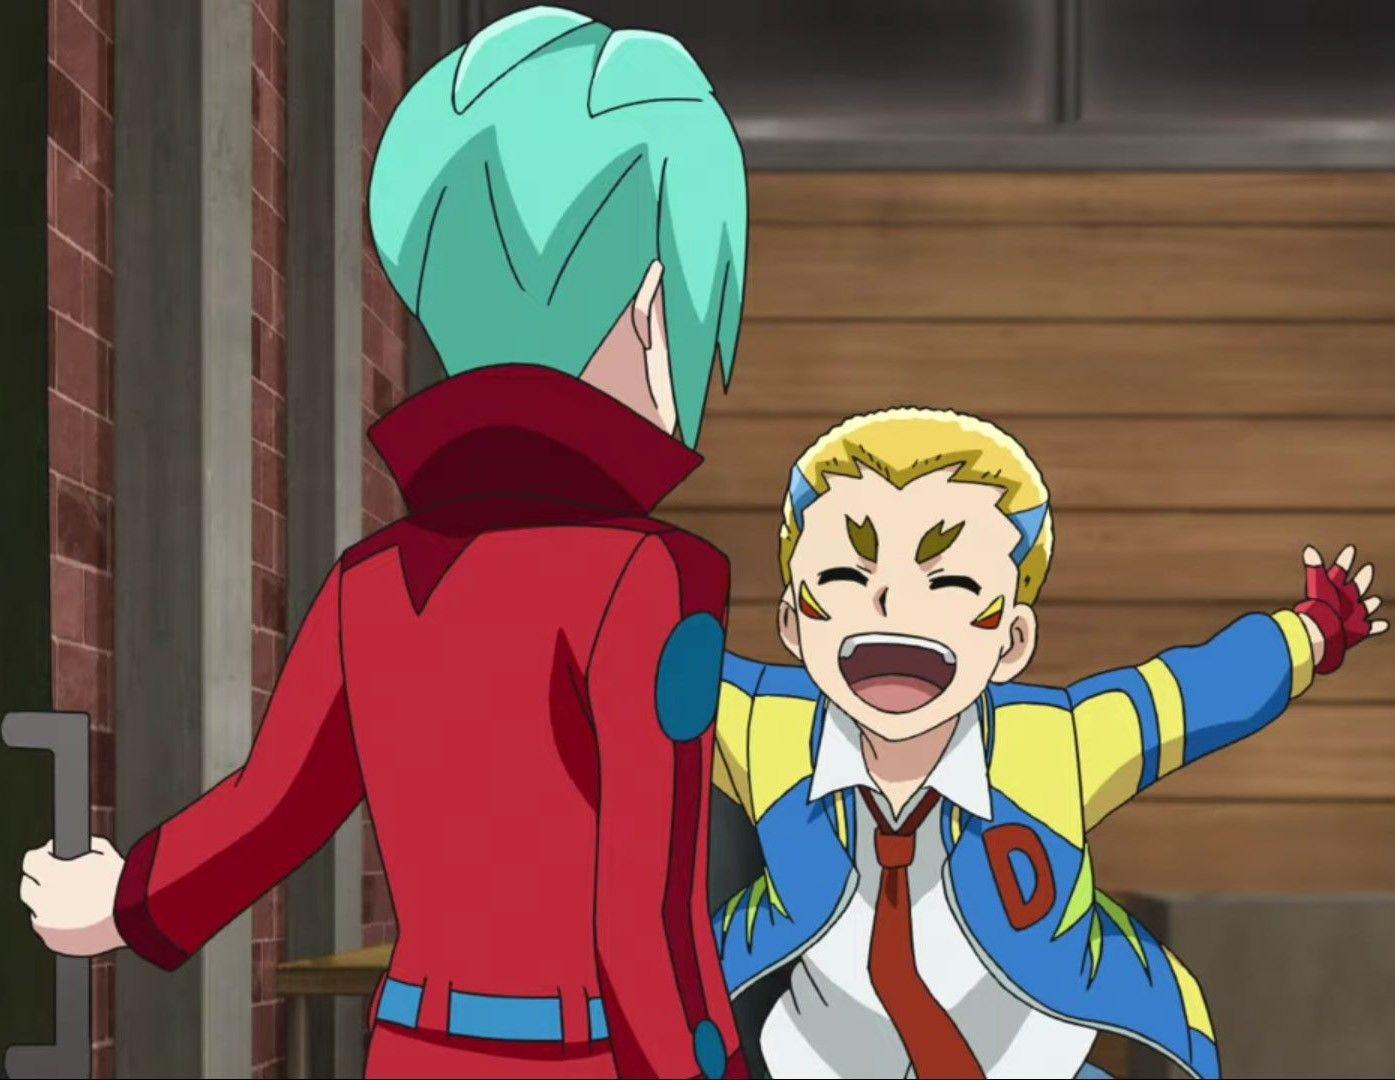 Pin by anime4ever on Beyblade burst Anime, Beyblade